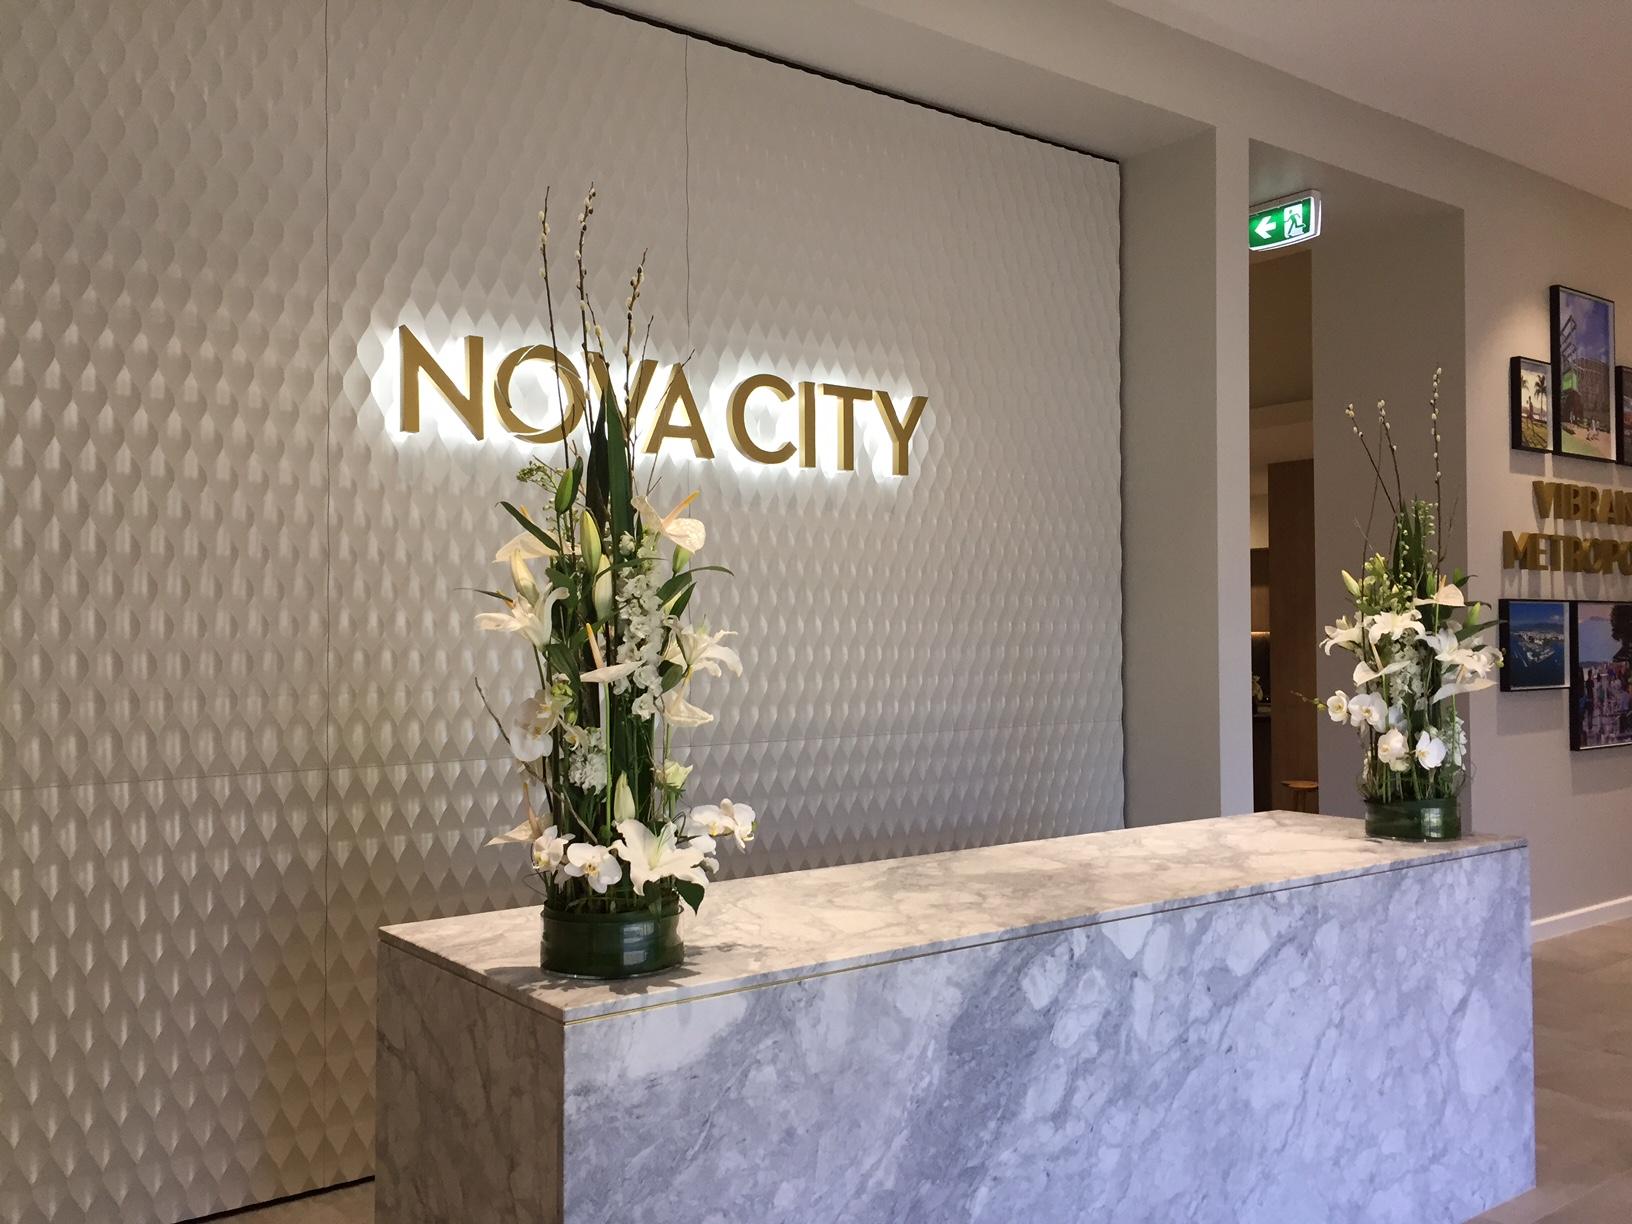 Nova City ディスプレールーム